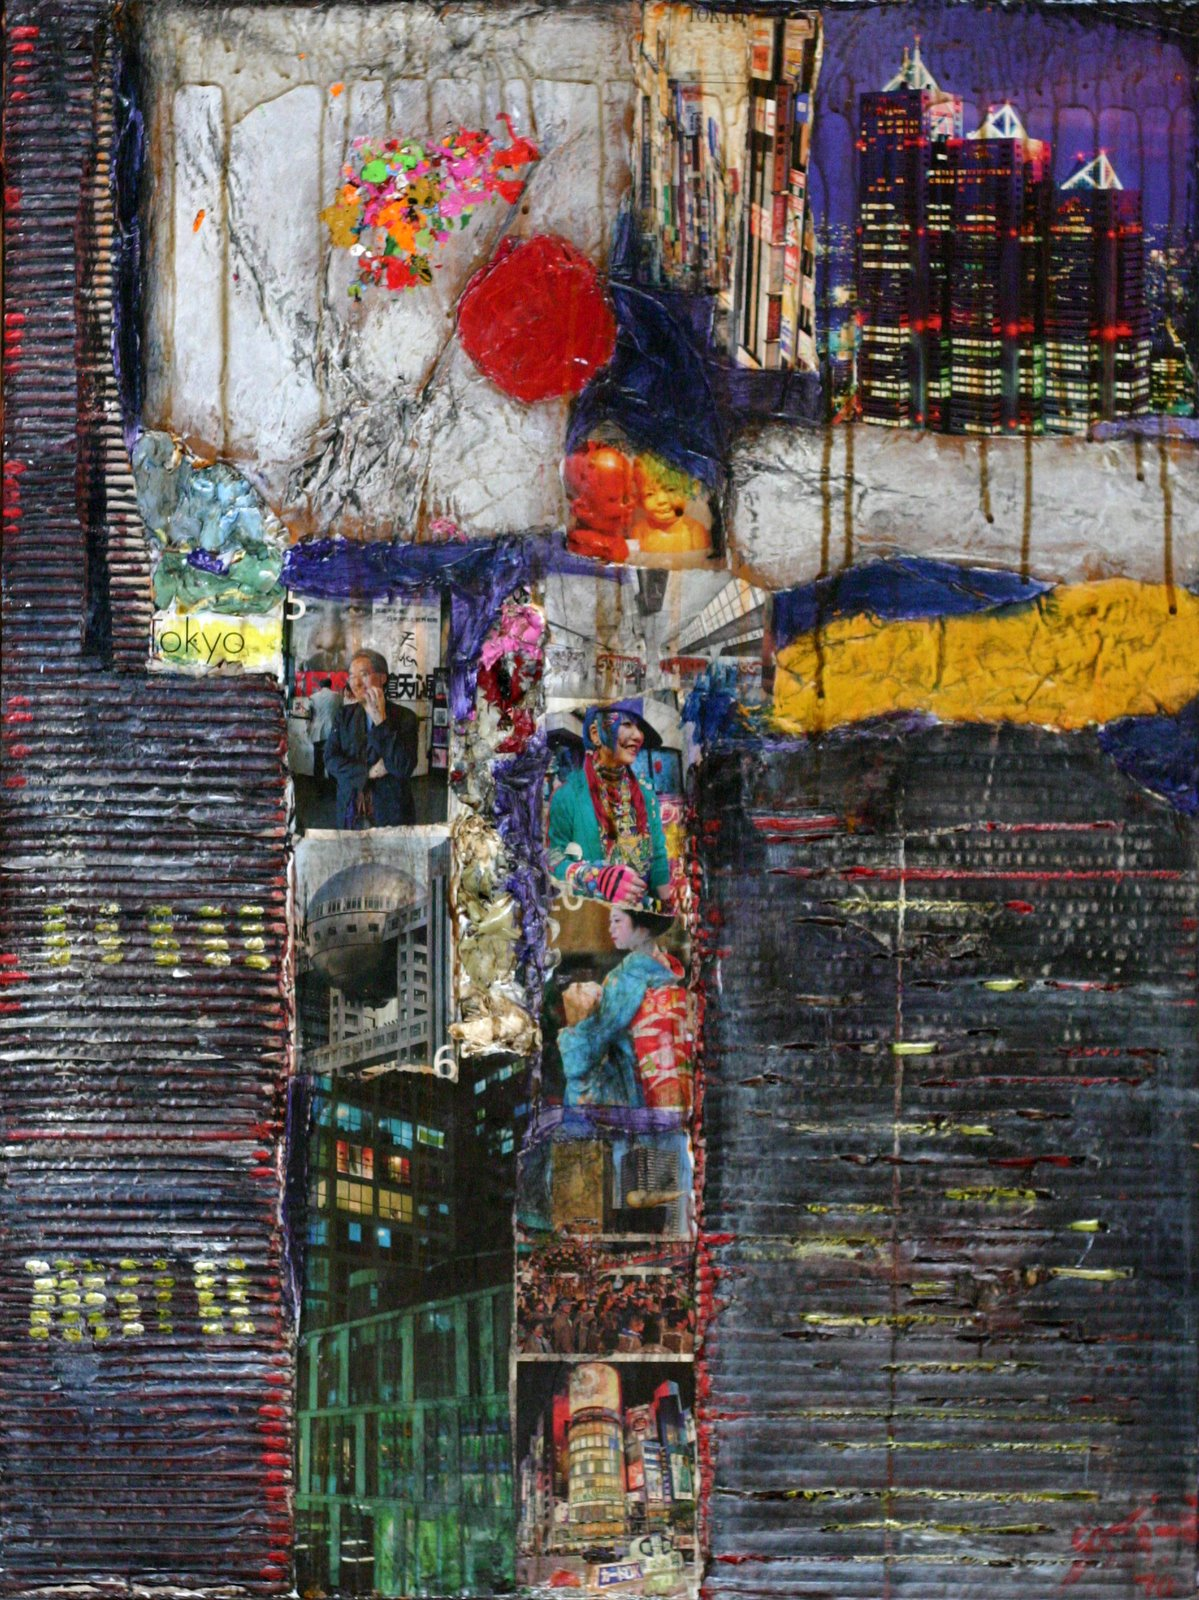 Tableau Contemporain, TOKYO by night. Sophie Costa, artiste peintre.